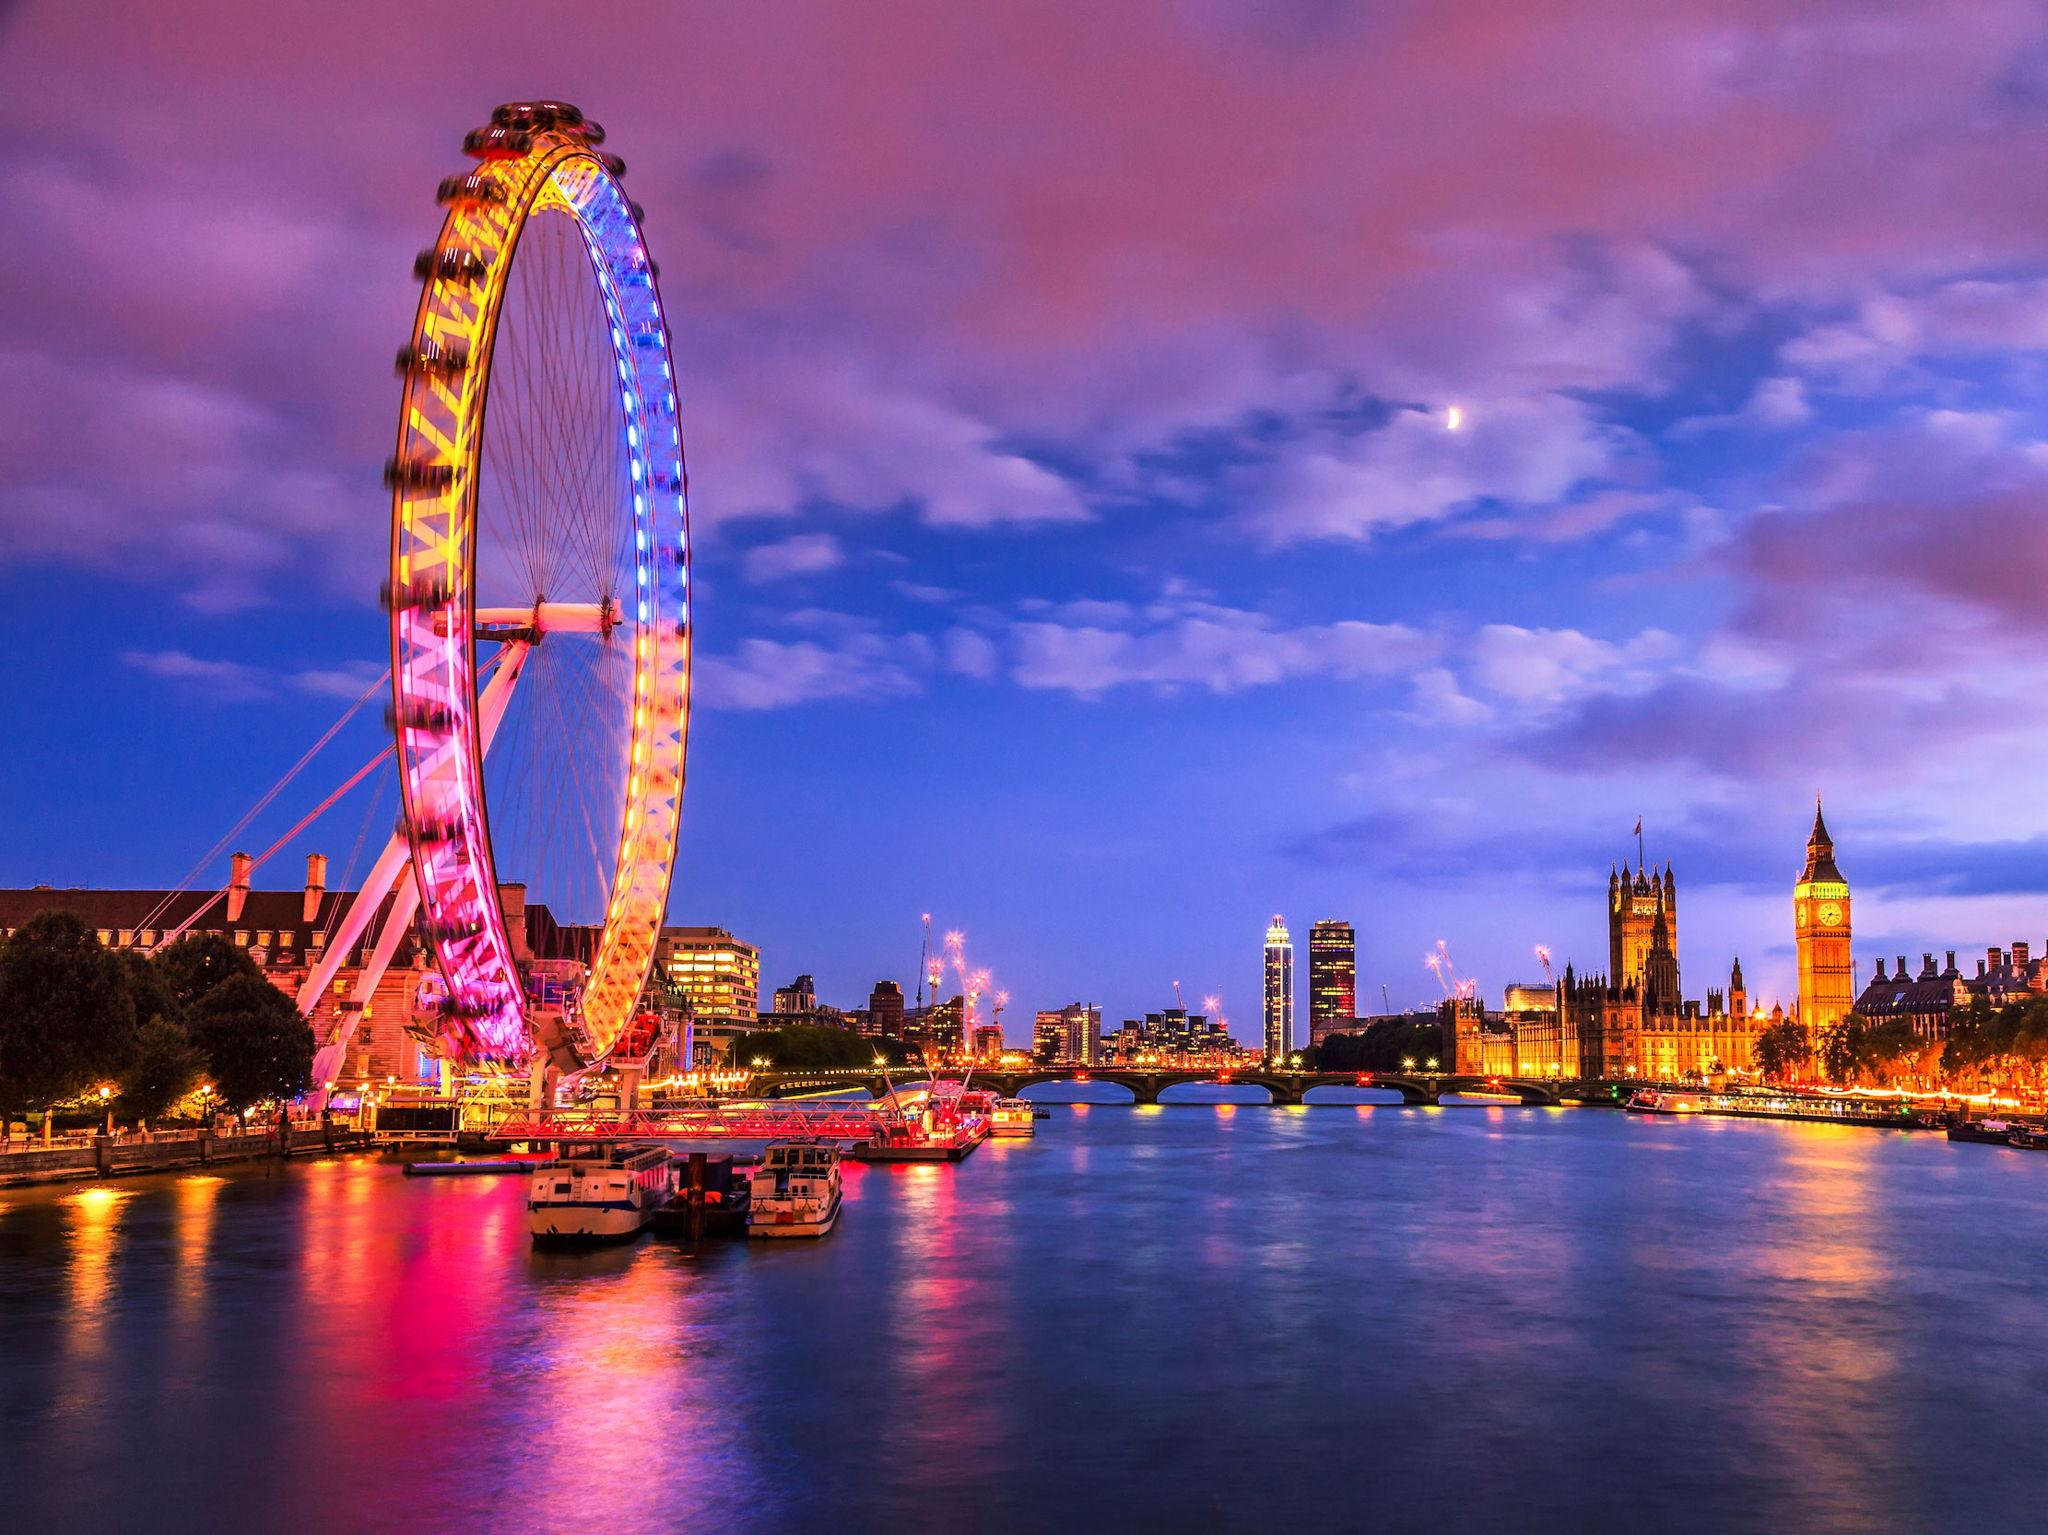 Urbanisation in the UK